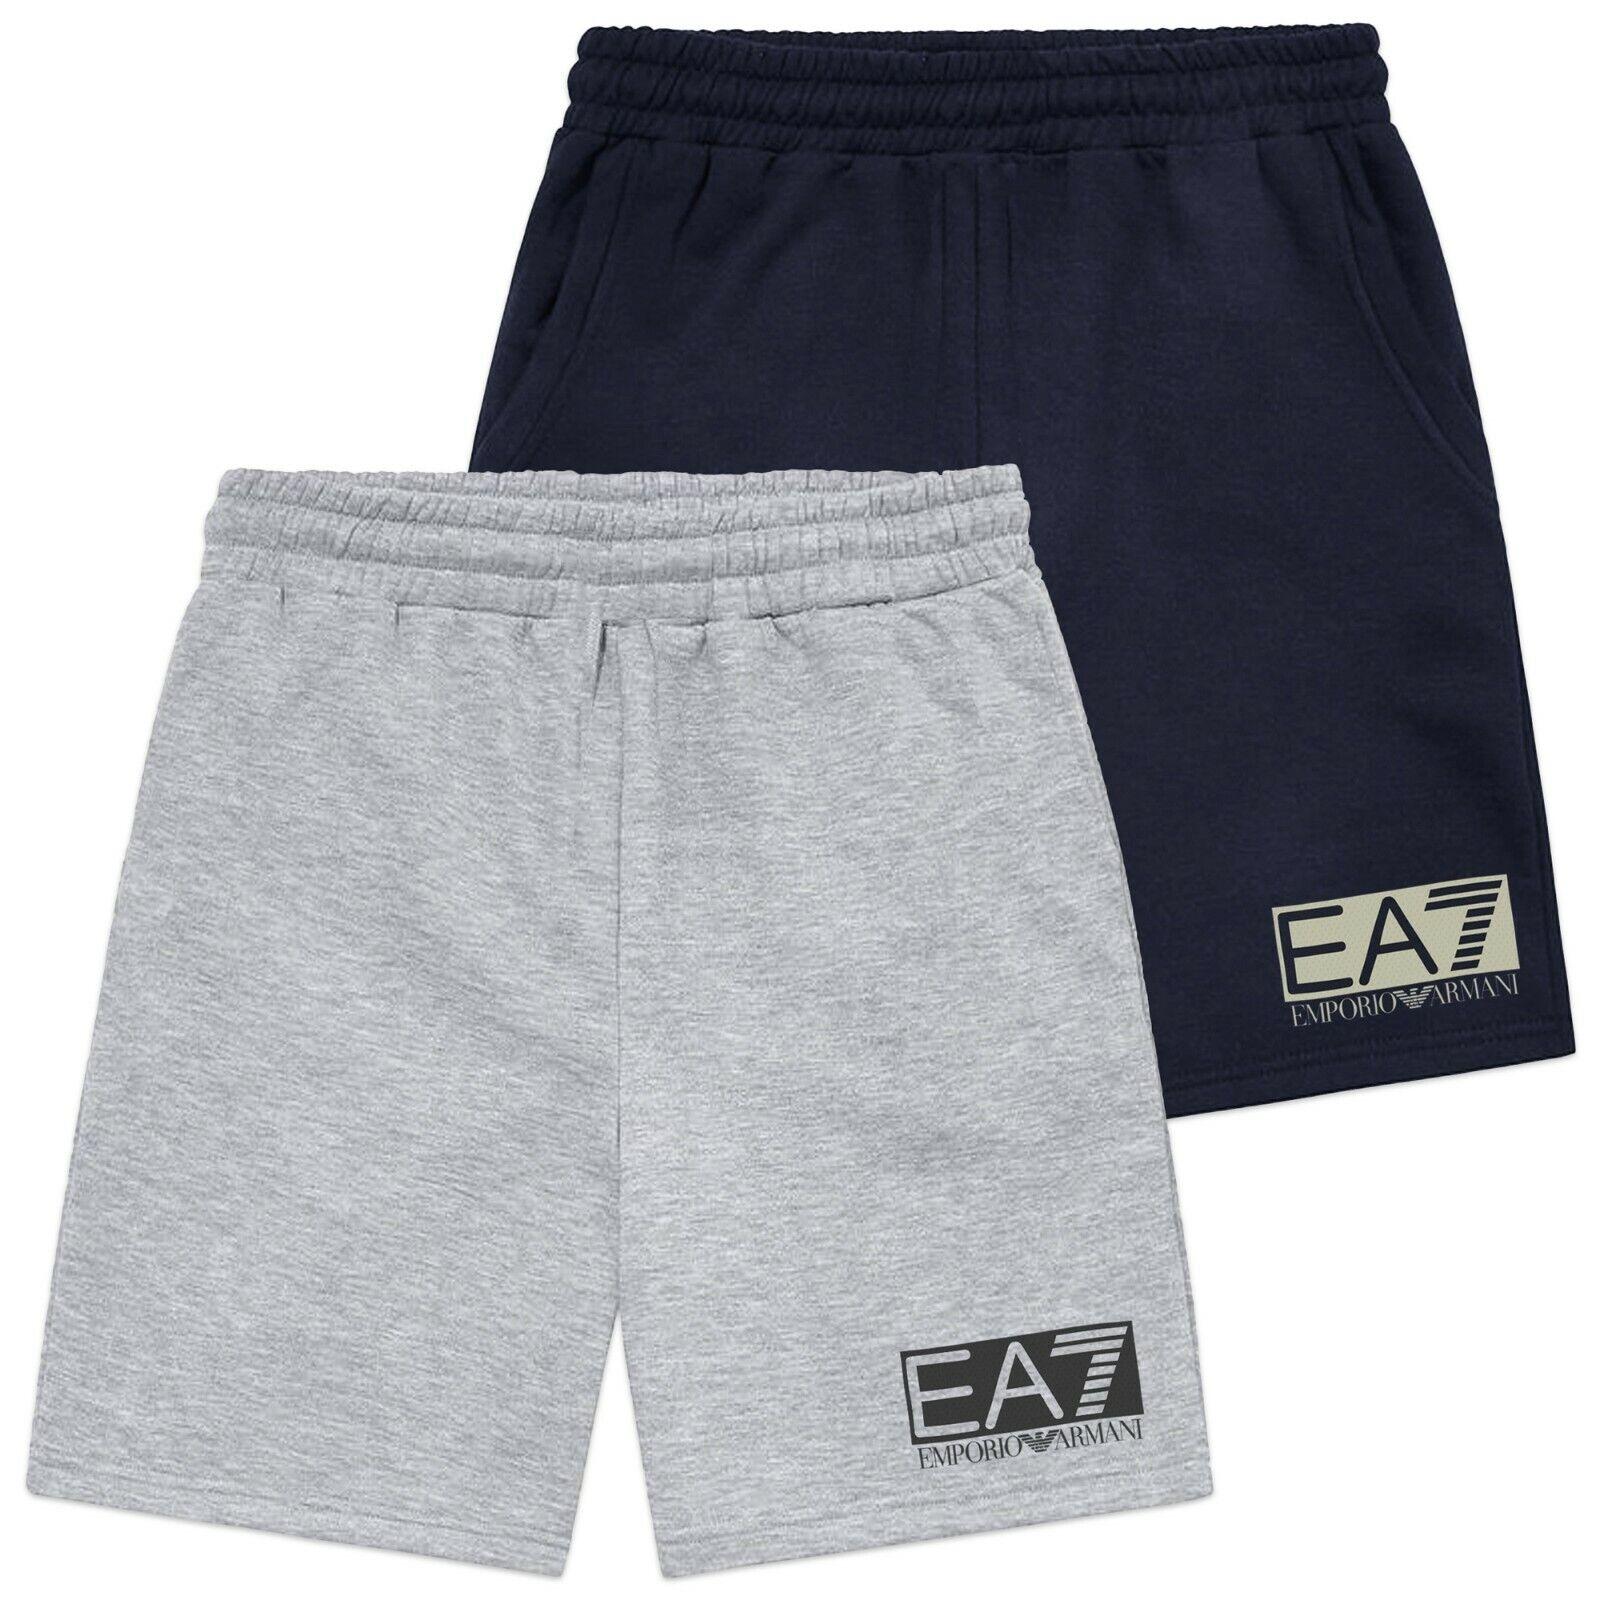 Emporio Armani Shorts - Emporio Armani EA7 Sichtbarkeit Jersey Shorts Shorts Shorts - grau, Navy c1b